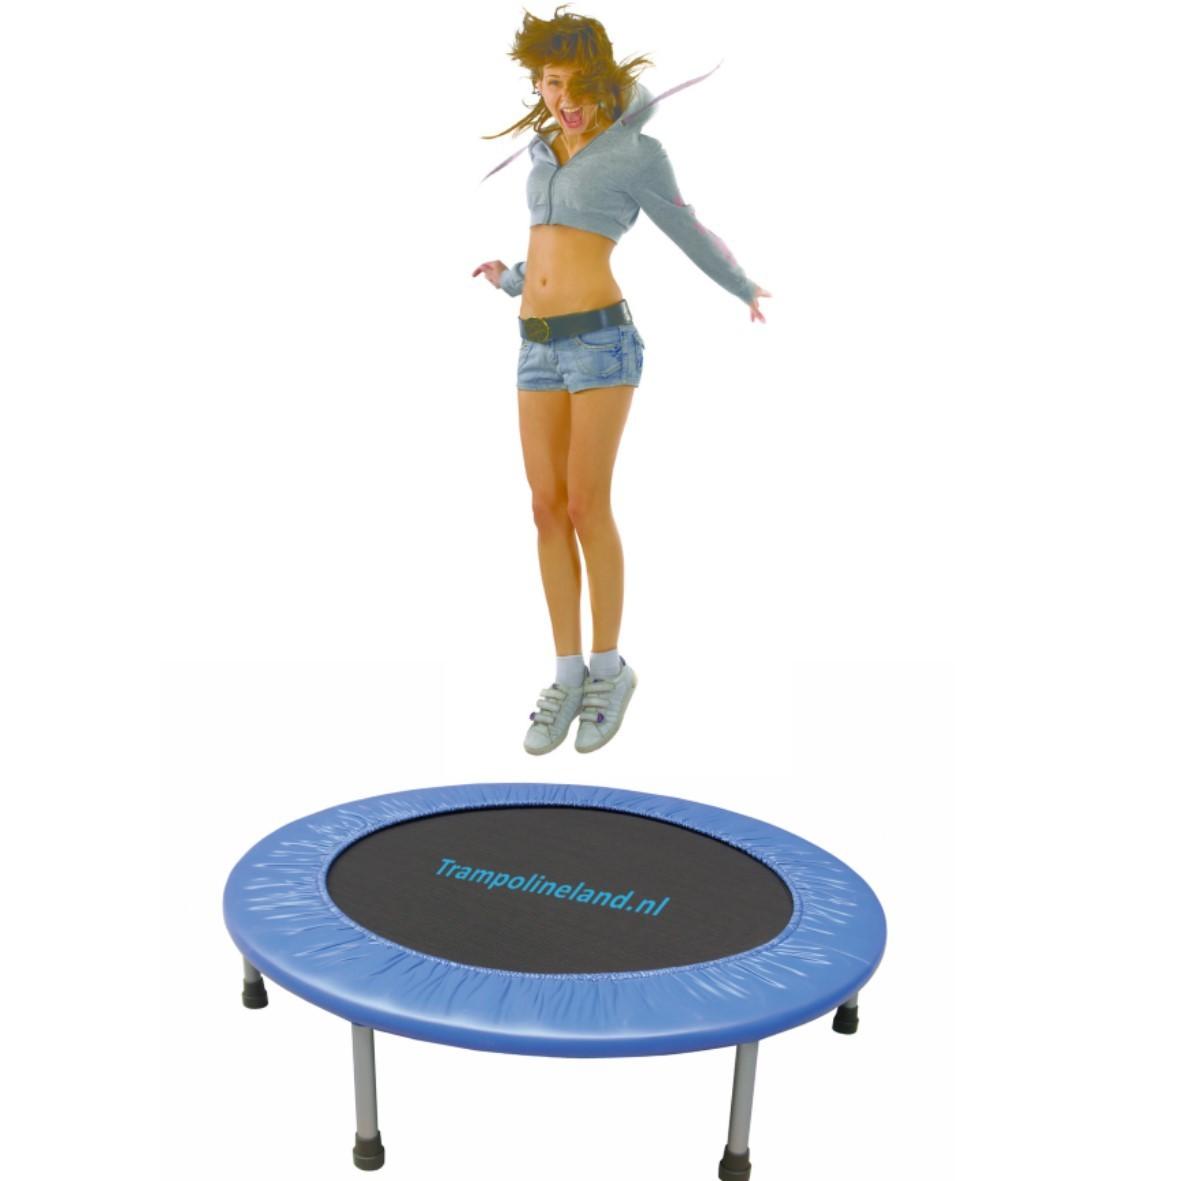 Trampolineland trampoline fitness